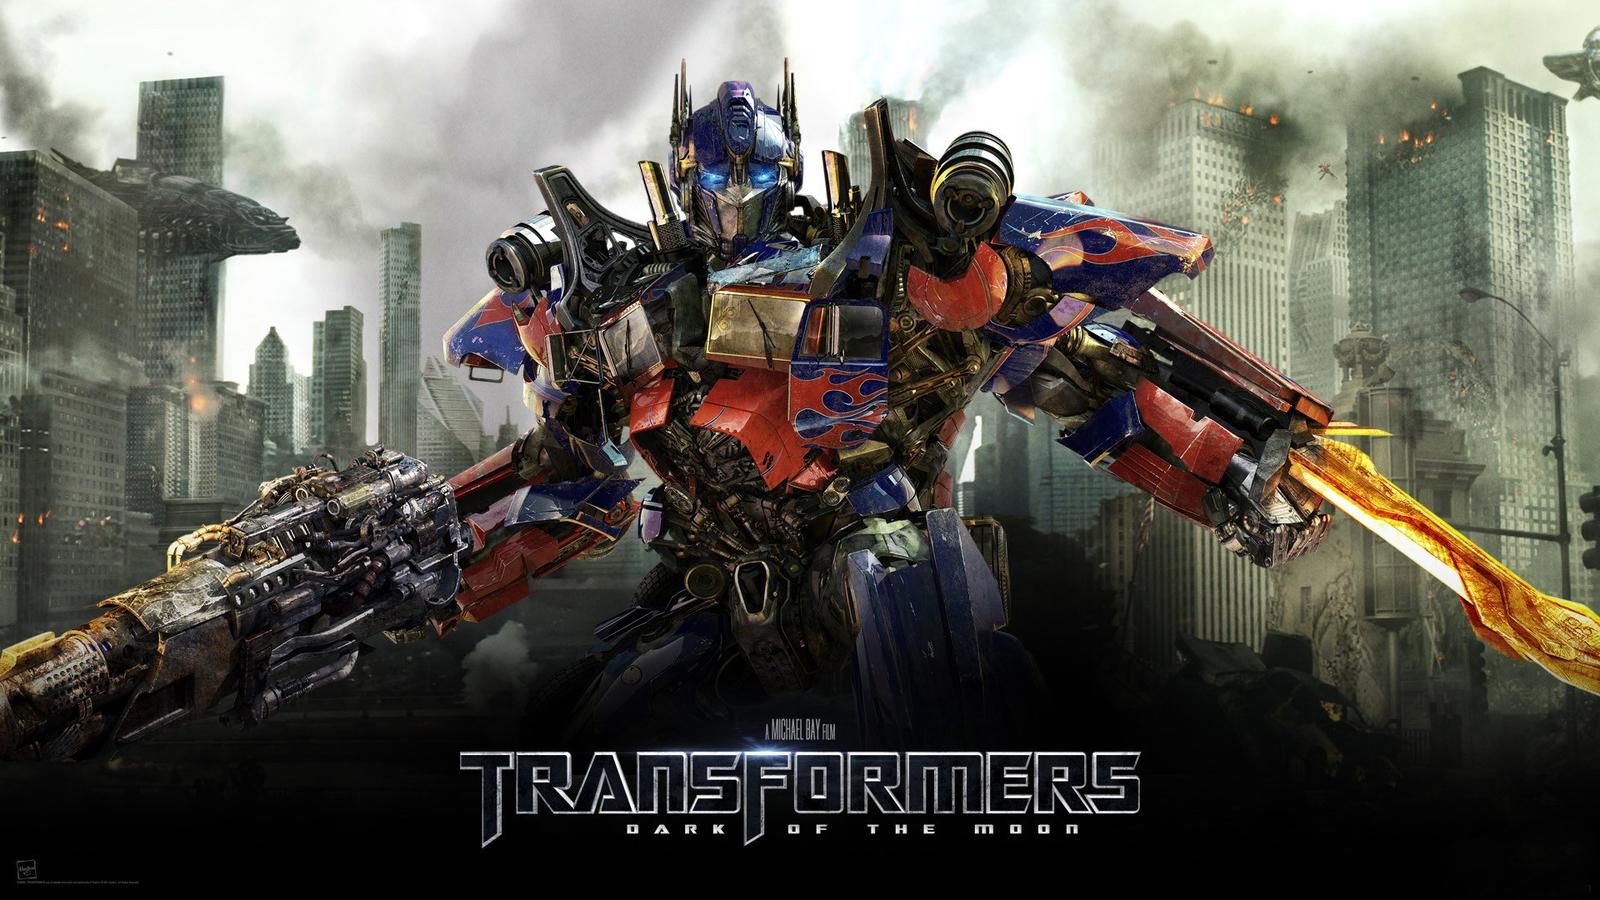 Transformers Desktop Wallpaper 50728   Movie Wallpapers   Television 1600x900